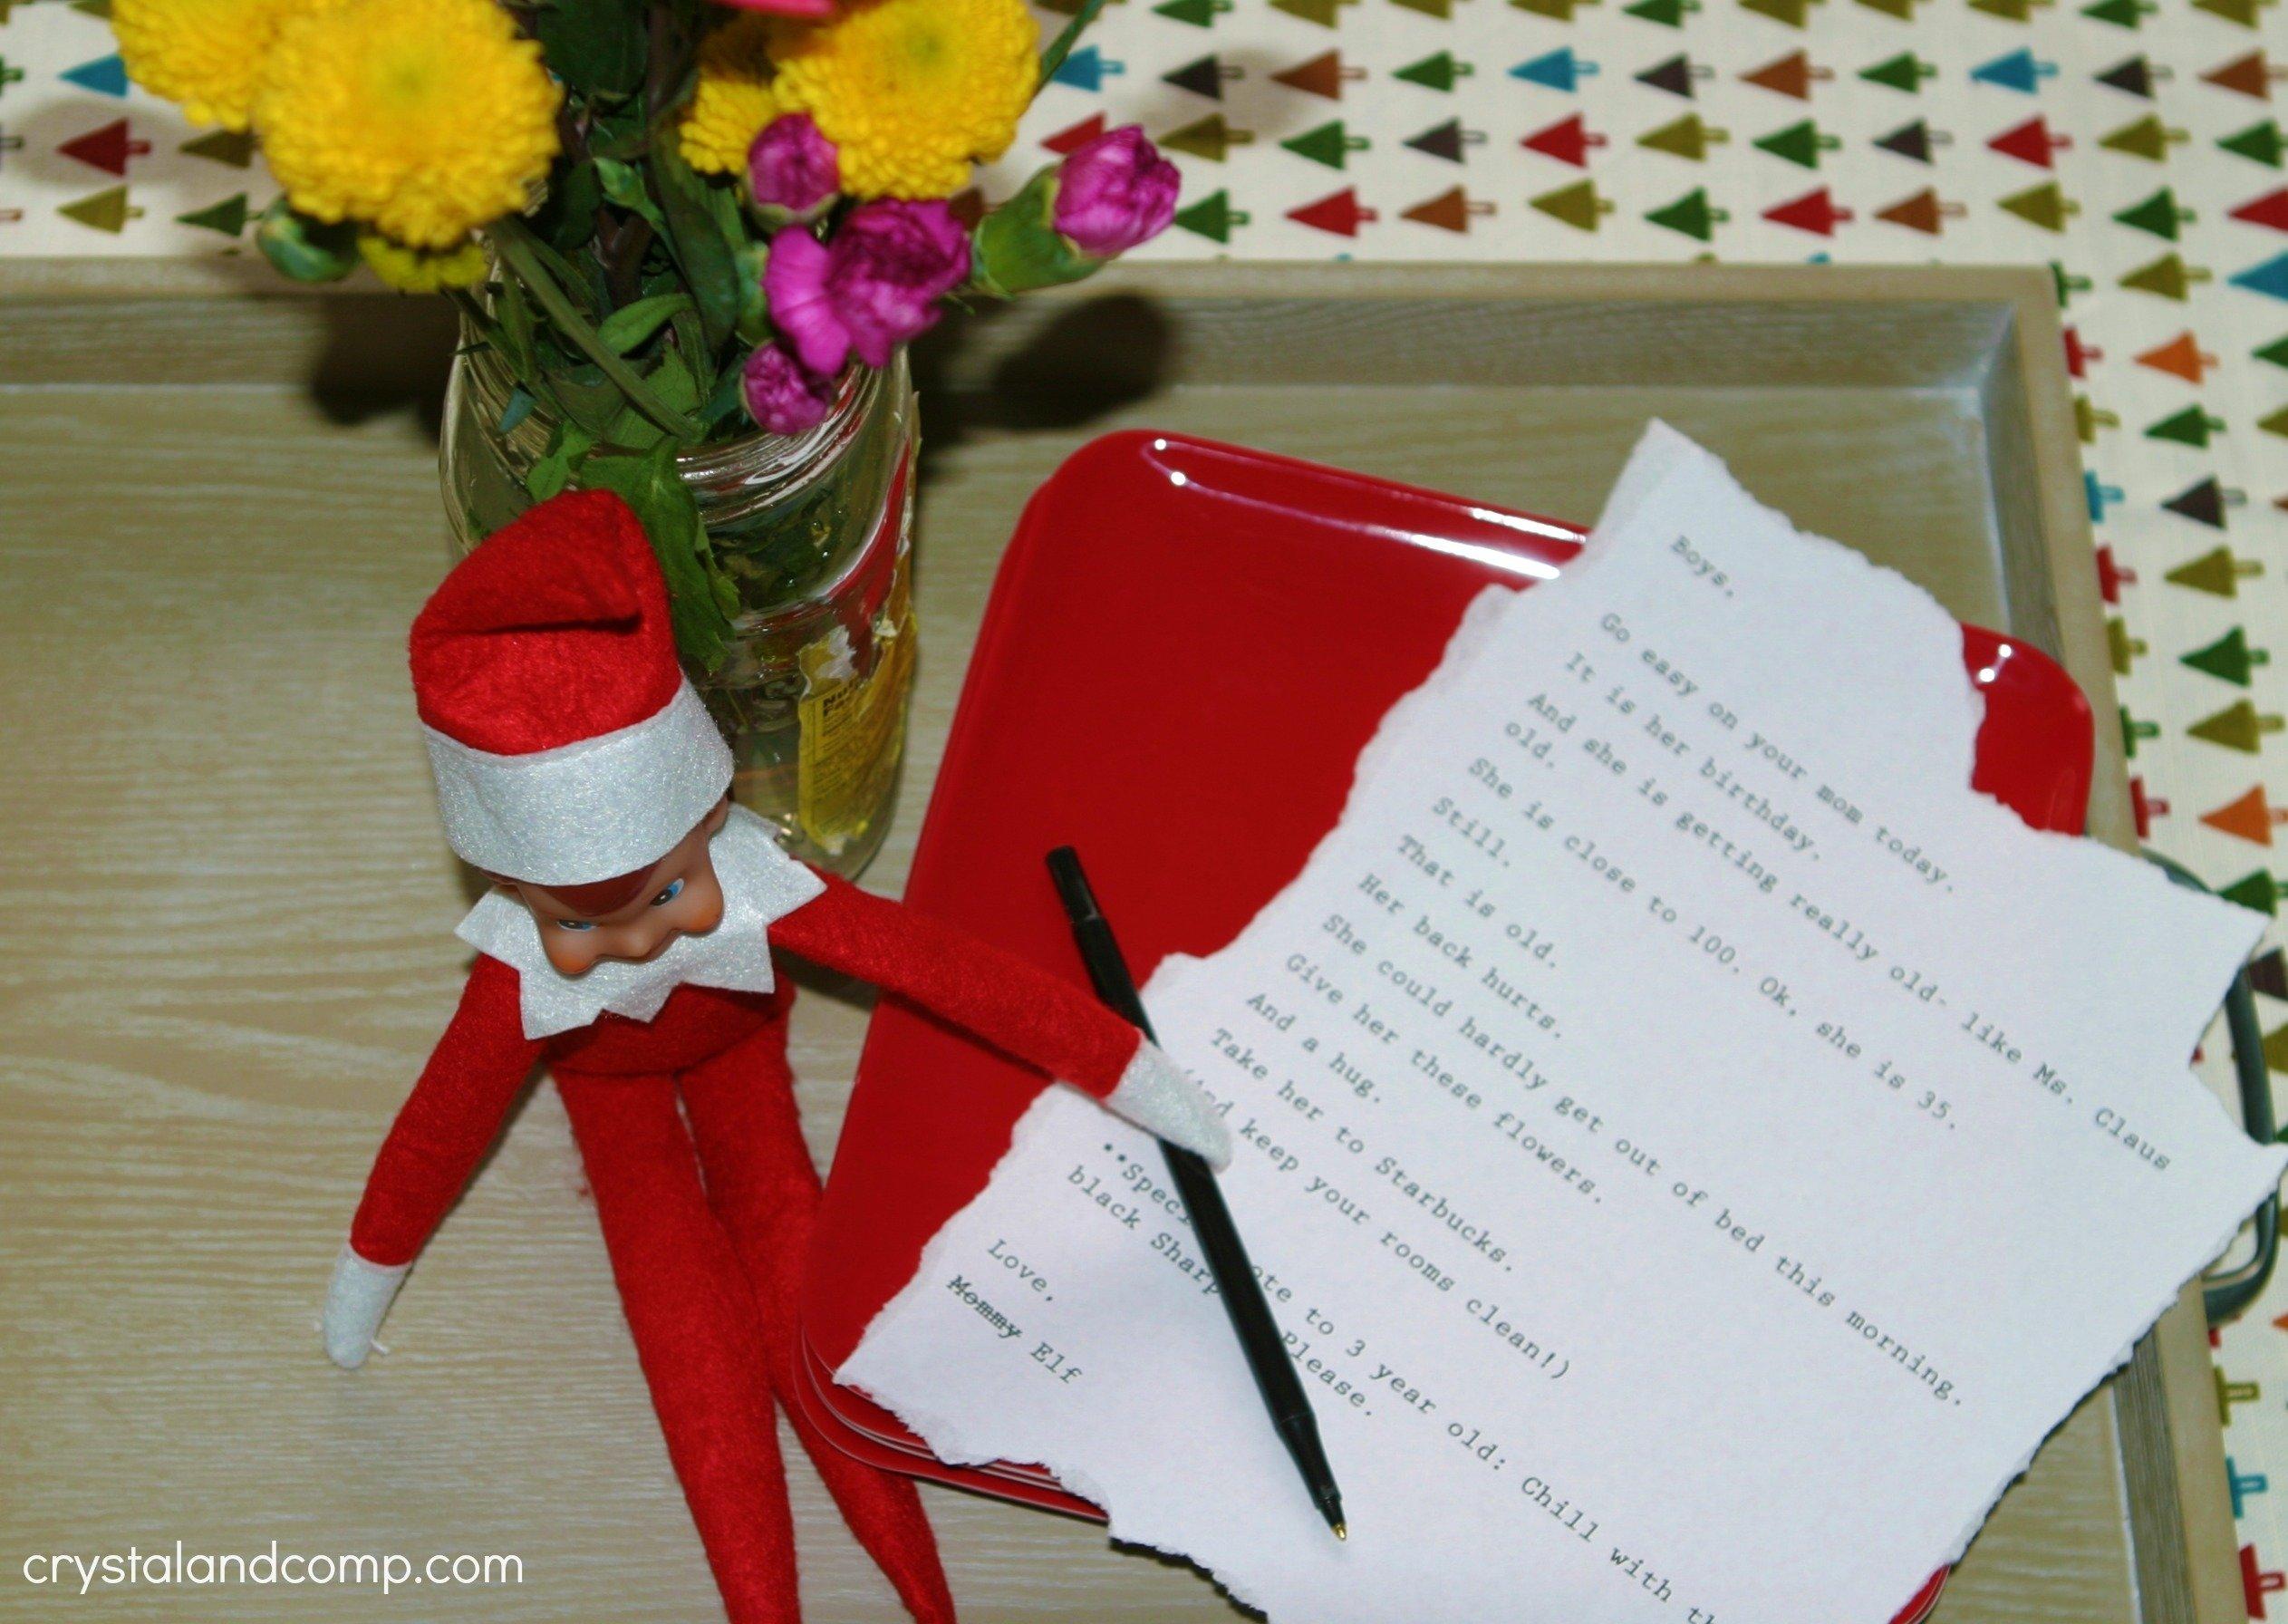 10 Best Elf On The Shelf Birthday Ideas elf on the shelf in which elf celebrates birthdays crystalandcomp 1